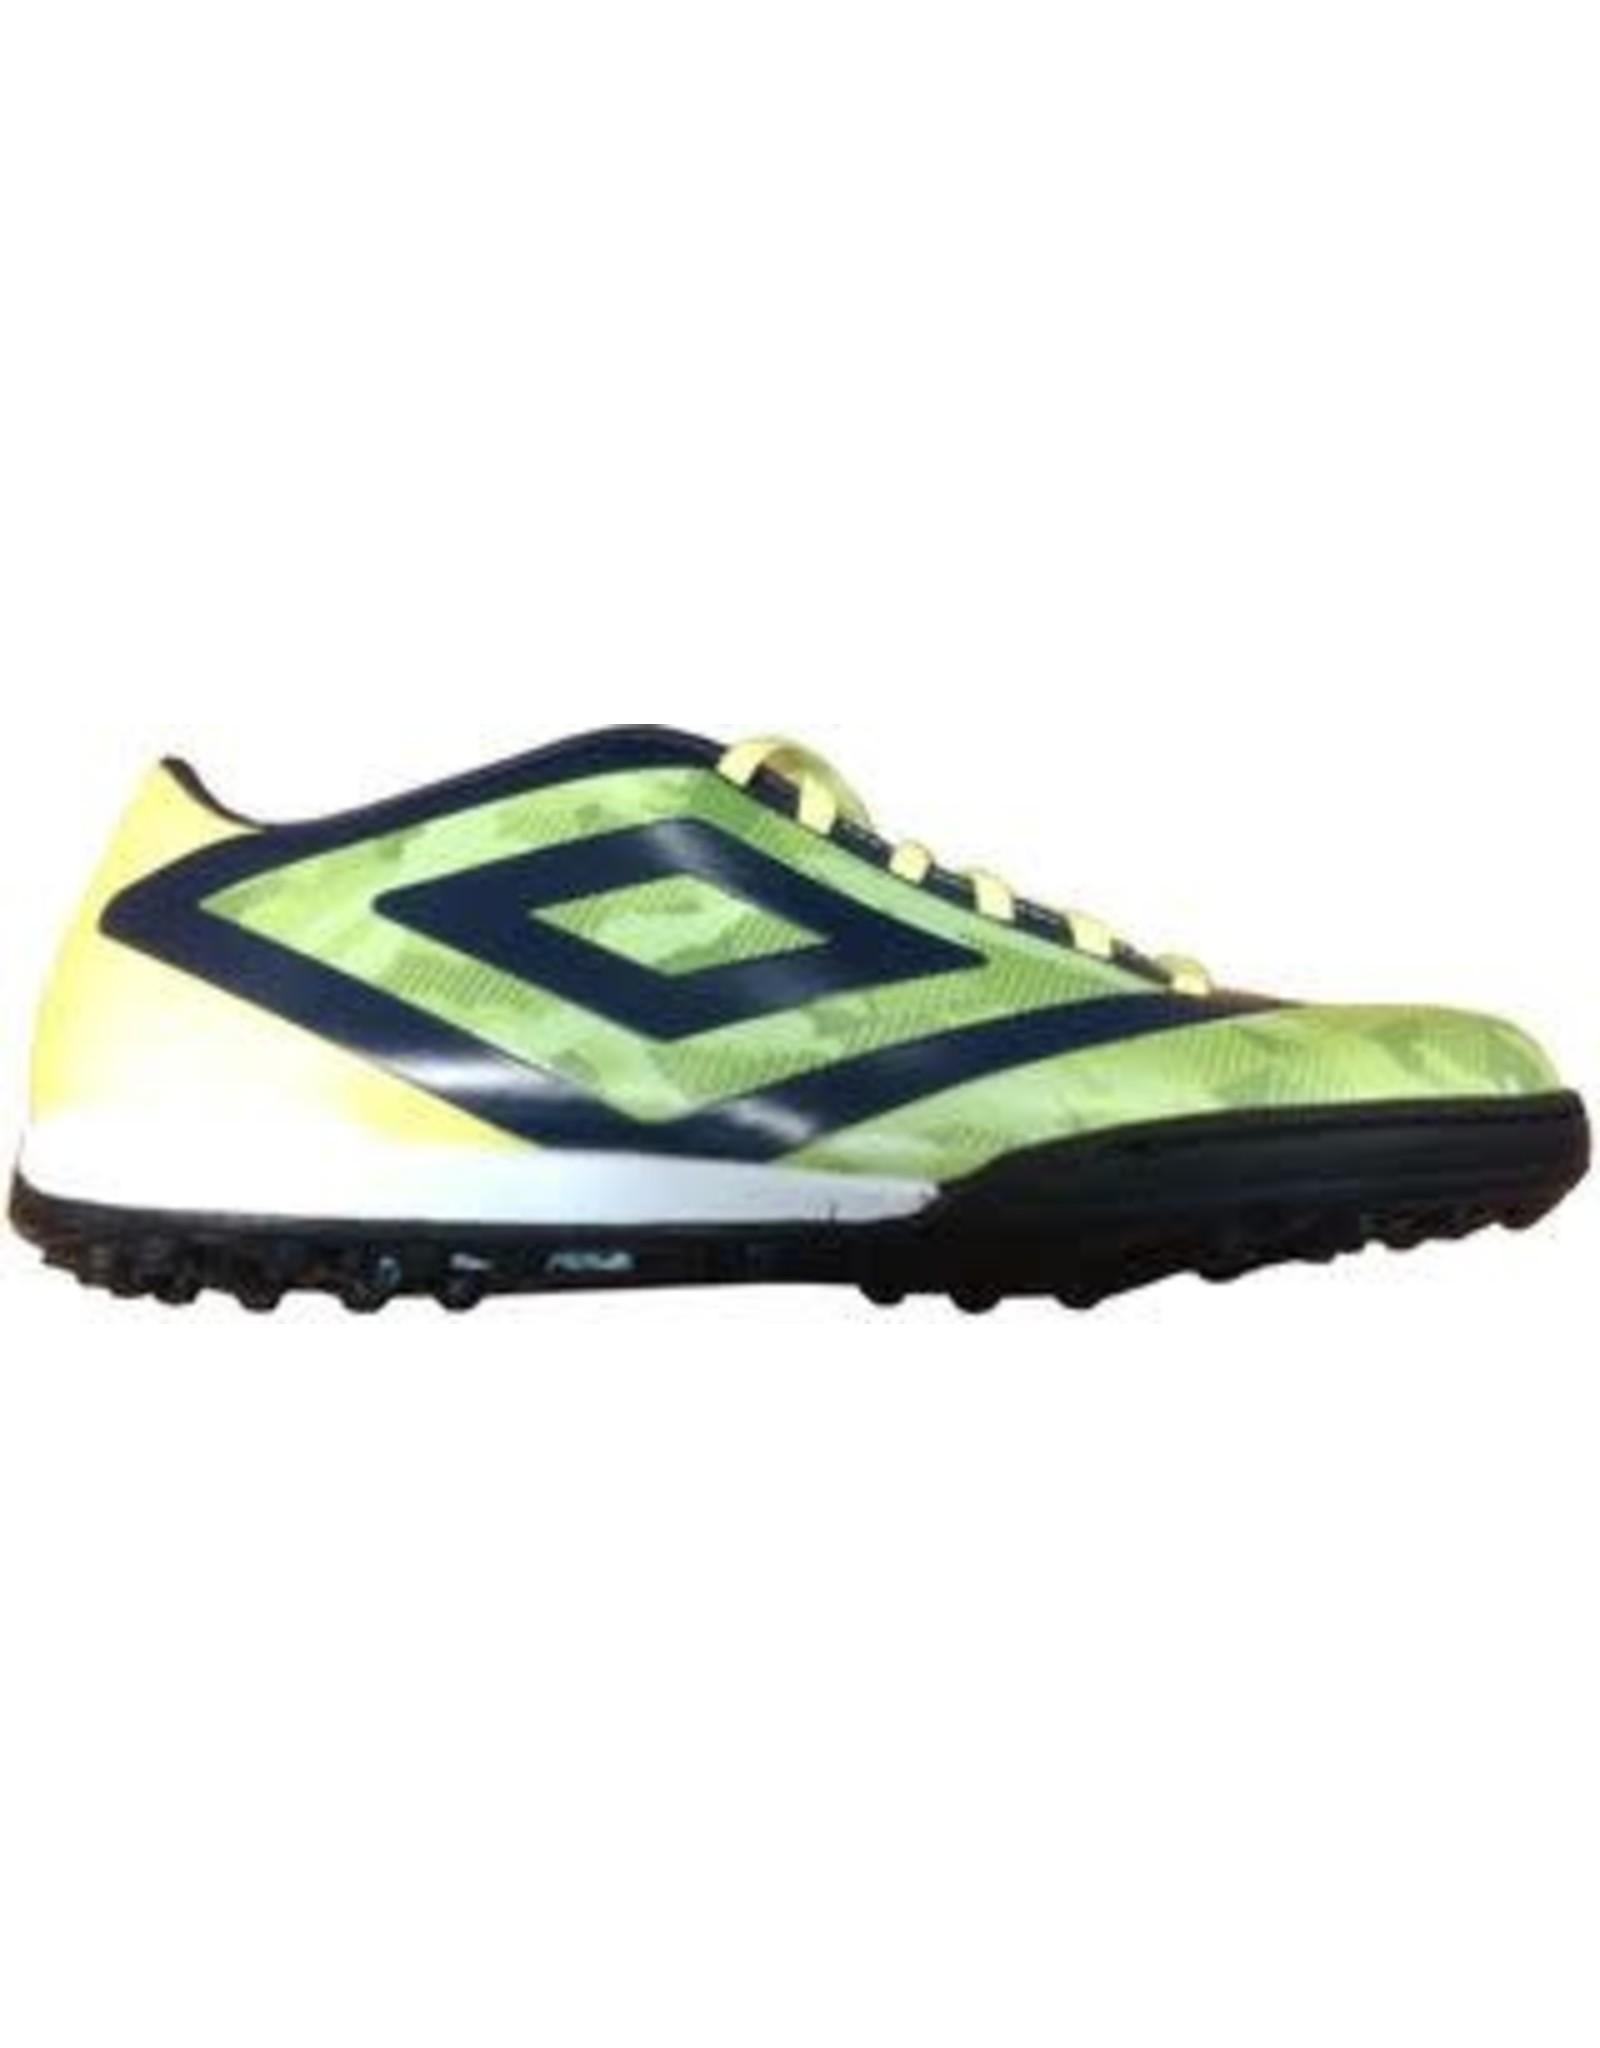 Umbro Umbro Geo Flare Club TF Shoes (Green Gecko/Blackberry/Safety Yellow)